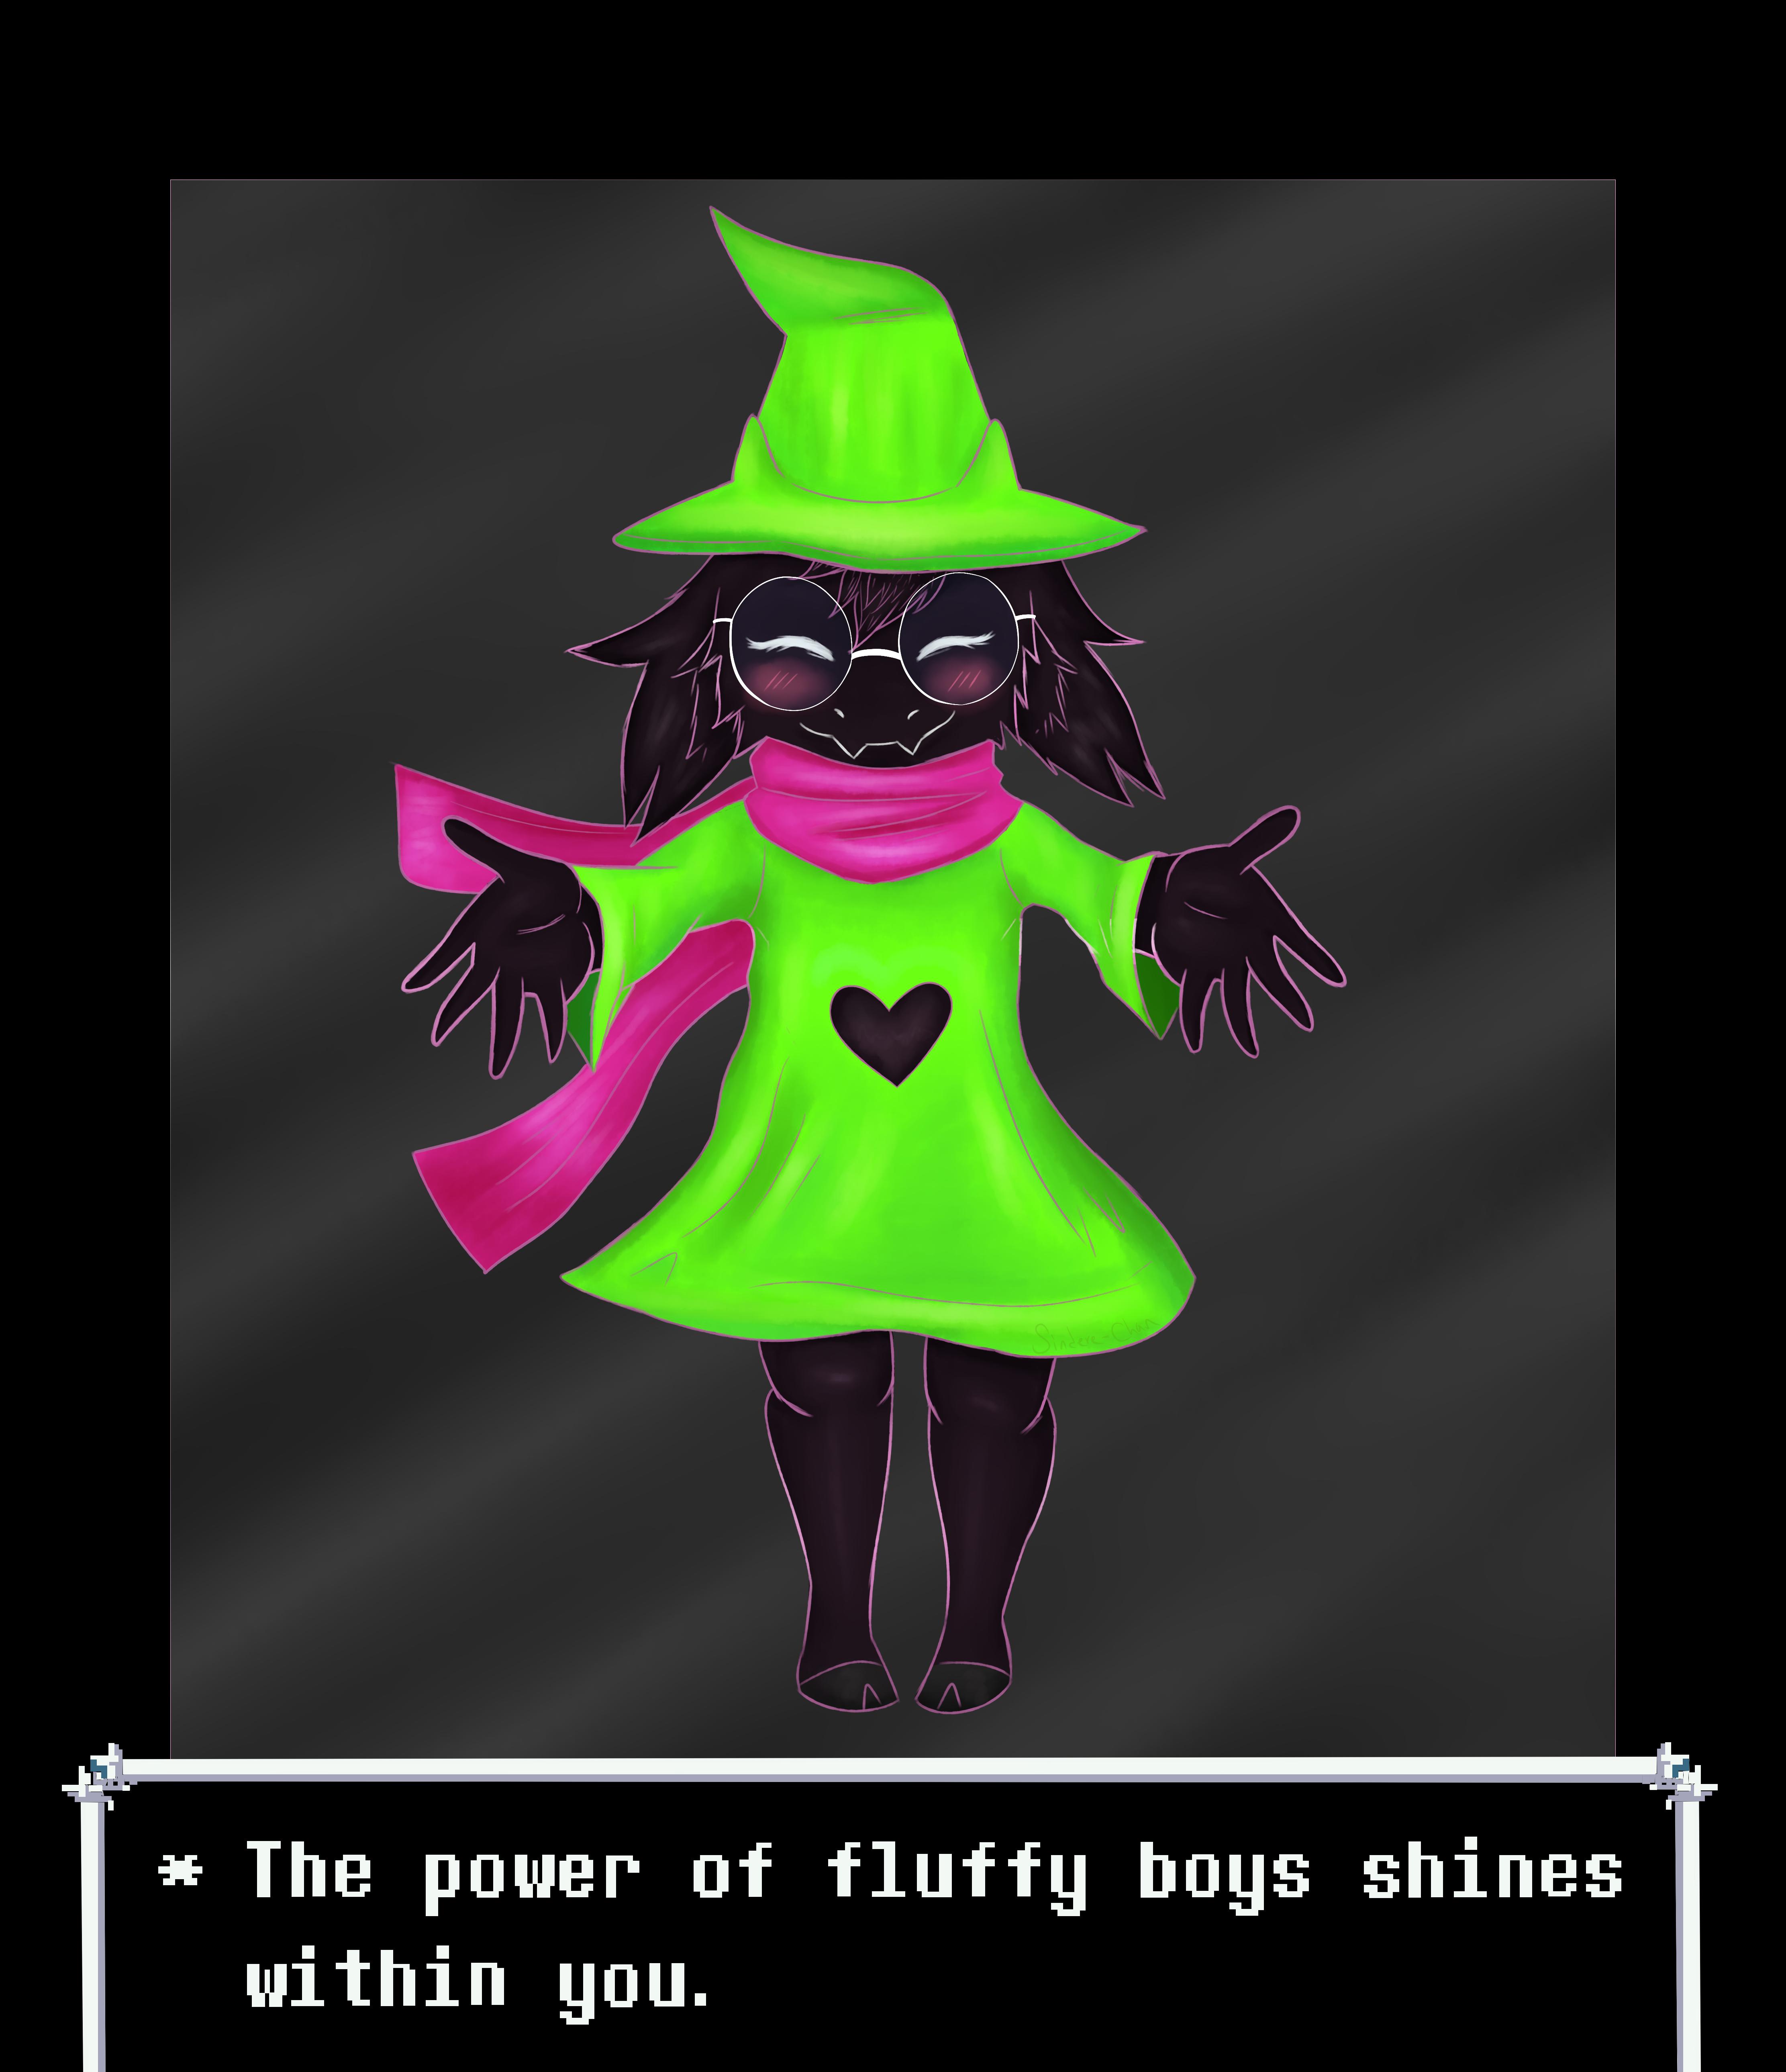 The Power of Fluffy Boys